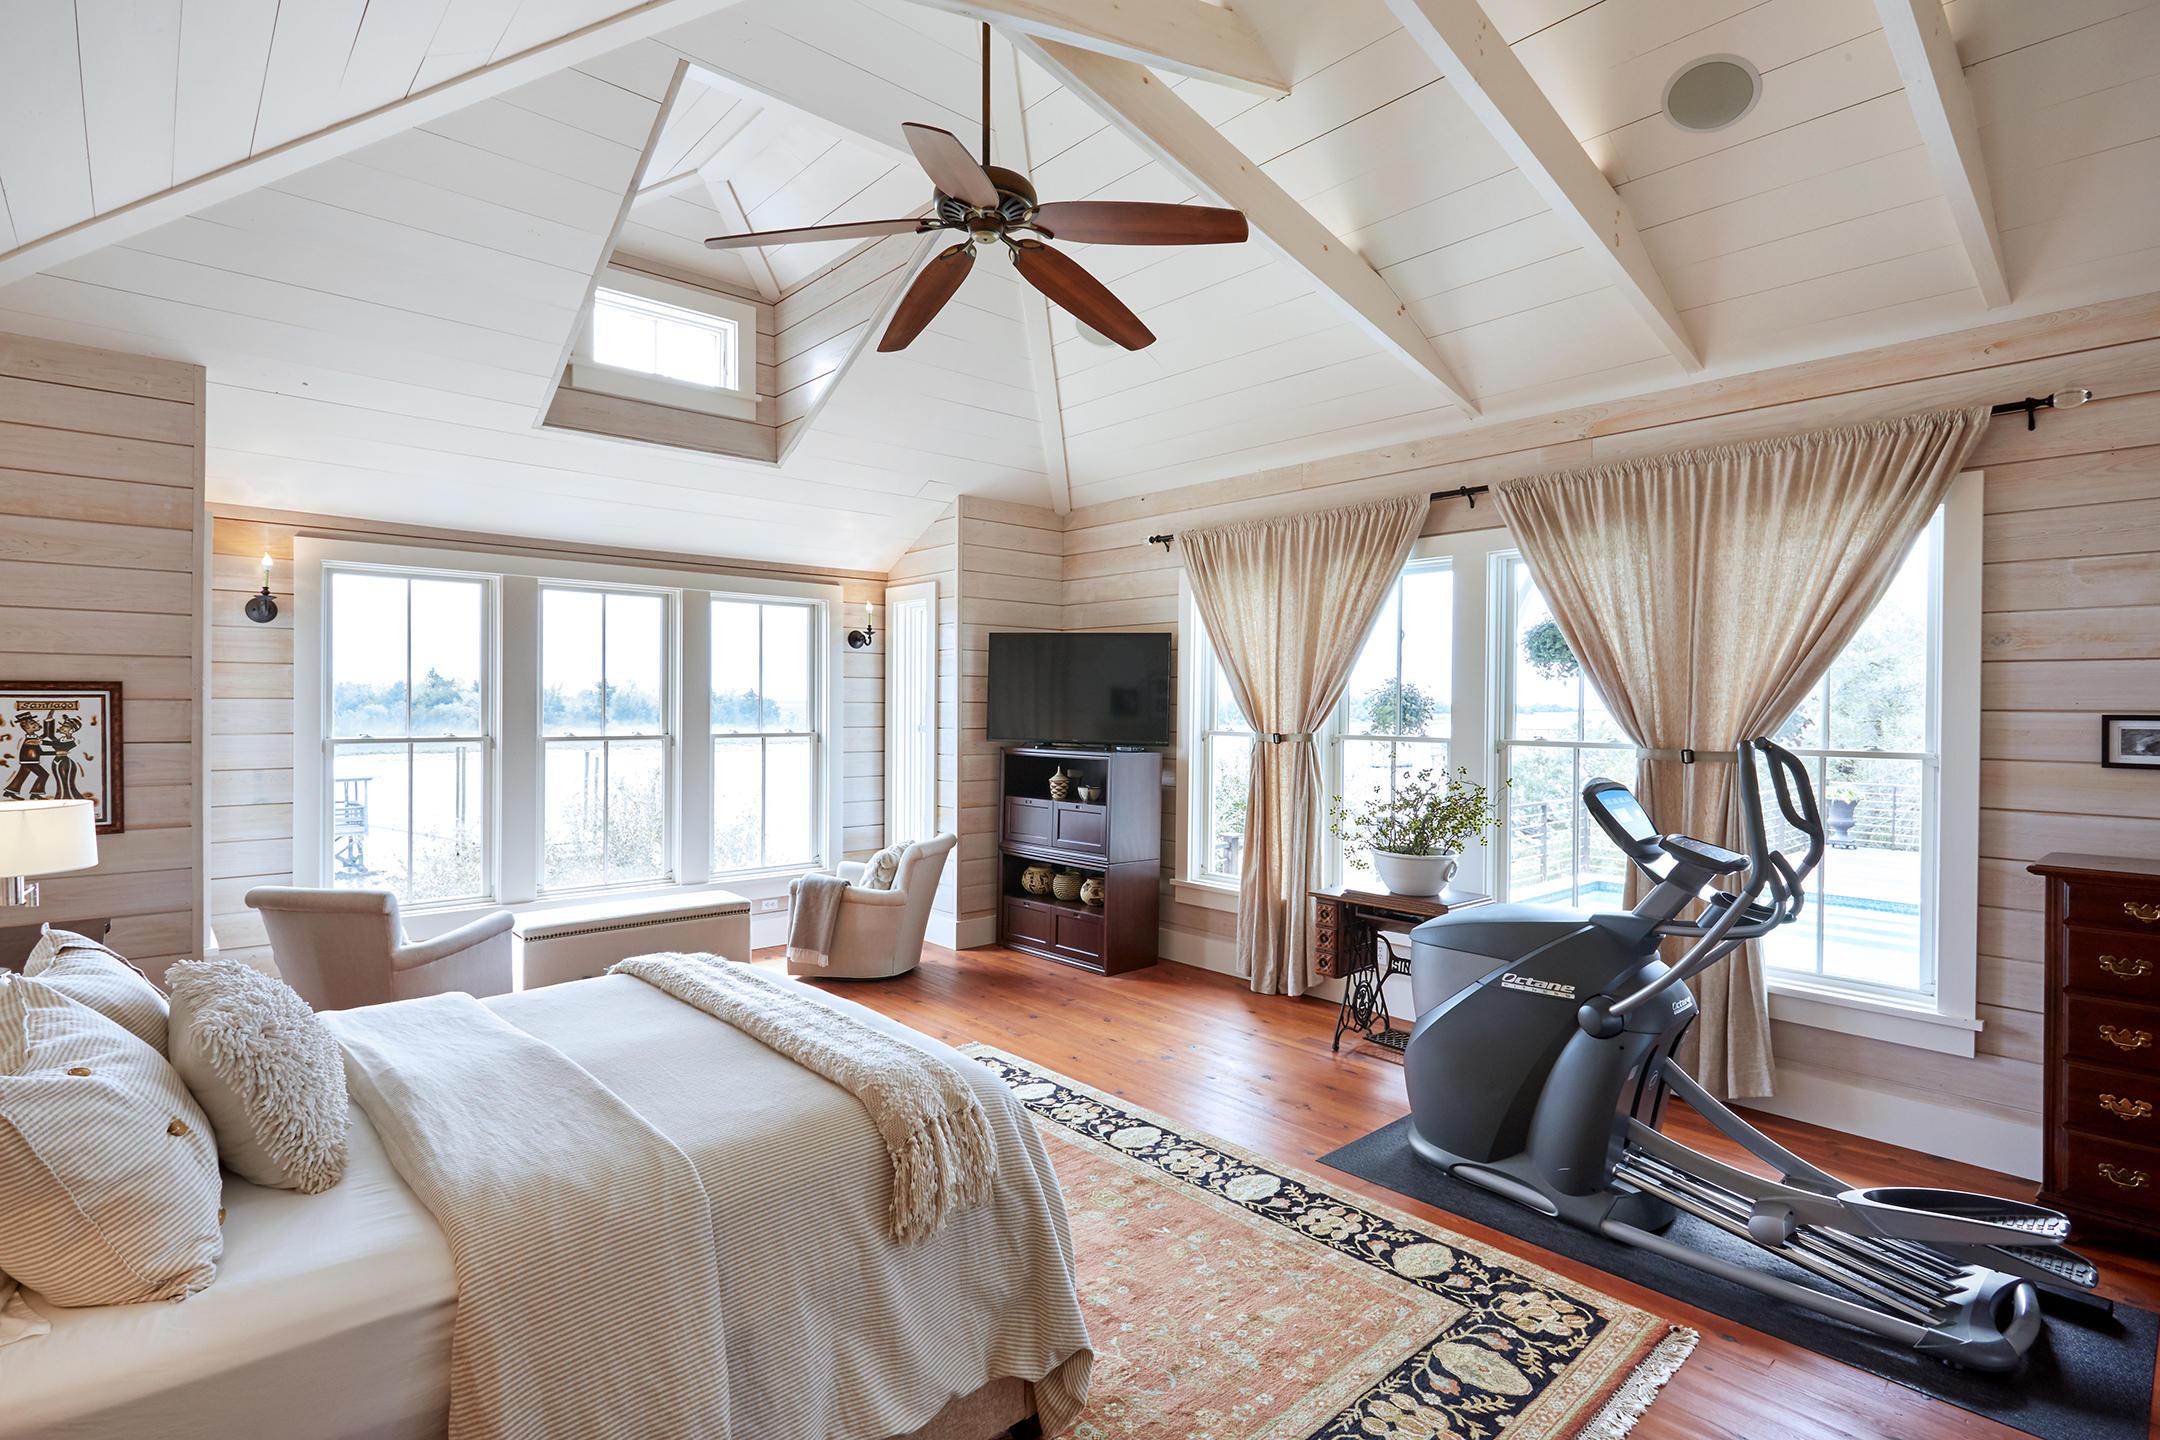 White Stalls Pt Jackson Homes For Sale - 625 Hall, Awendaw, SC - 30